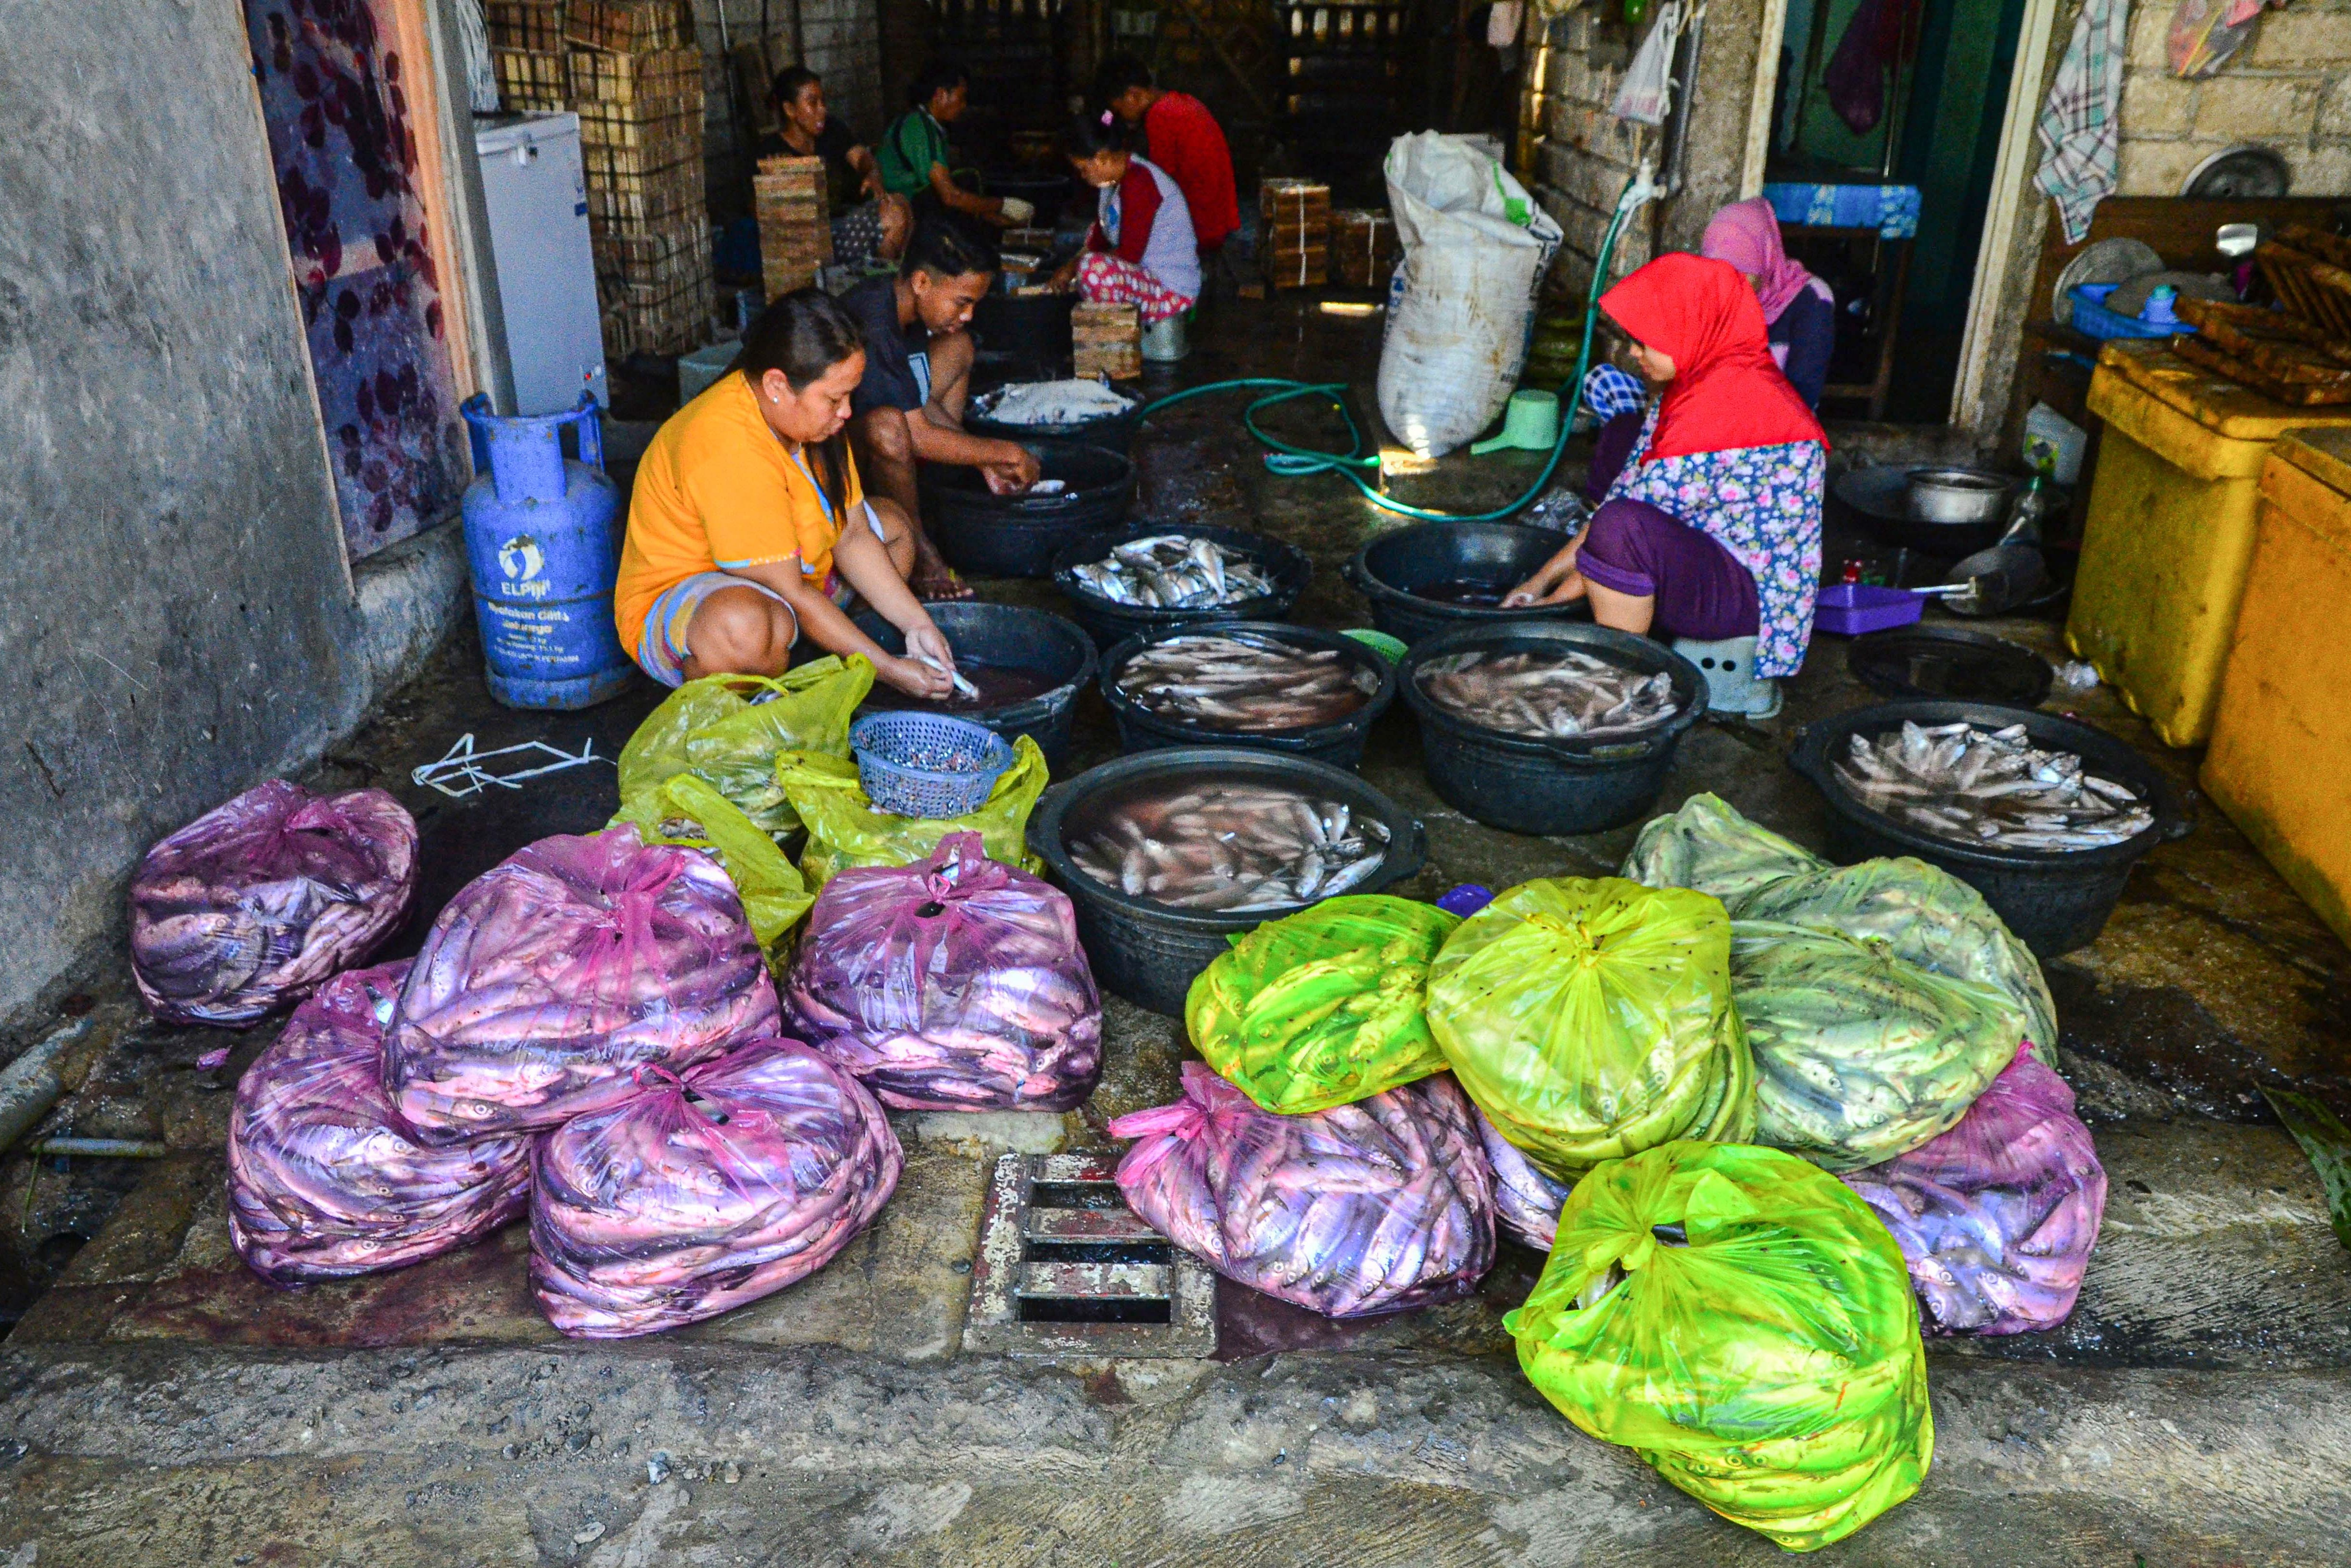 Pekerja membersihkan ikan bandeng di Desa Dukutalit, Juwana, Pati, Jawa Tengah.\r\n